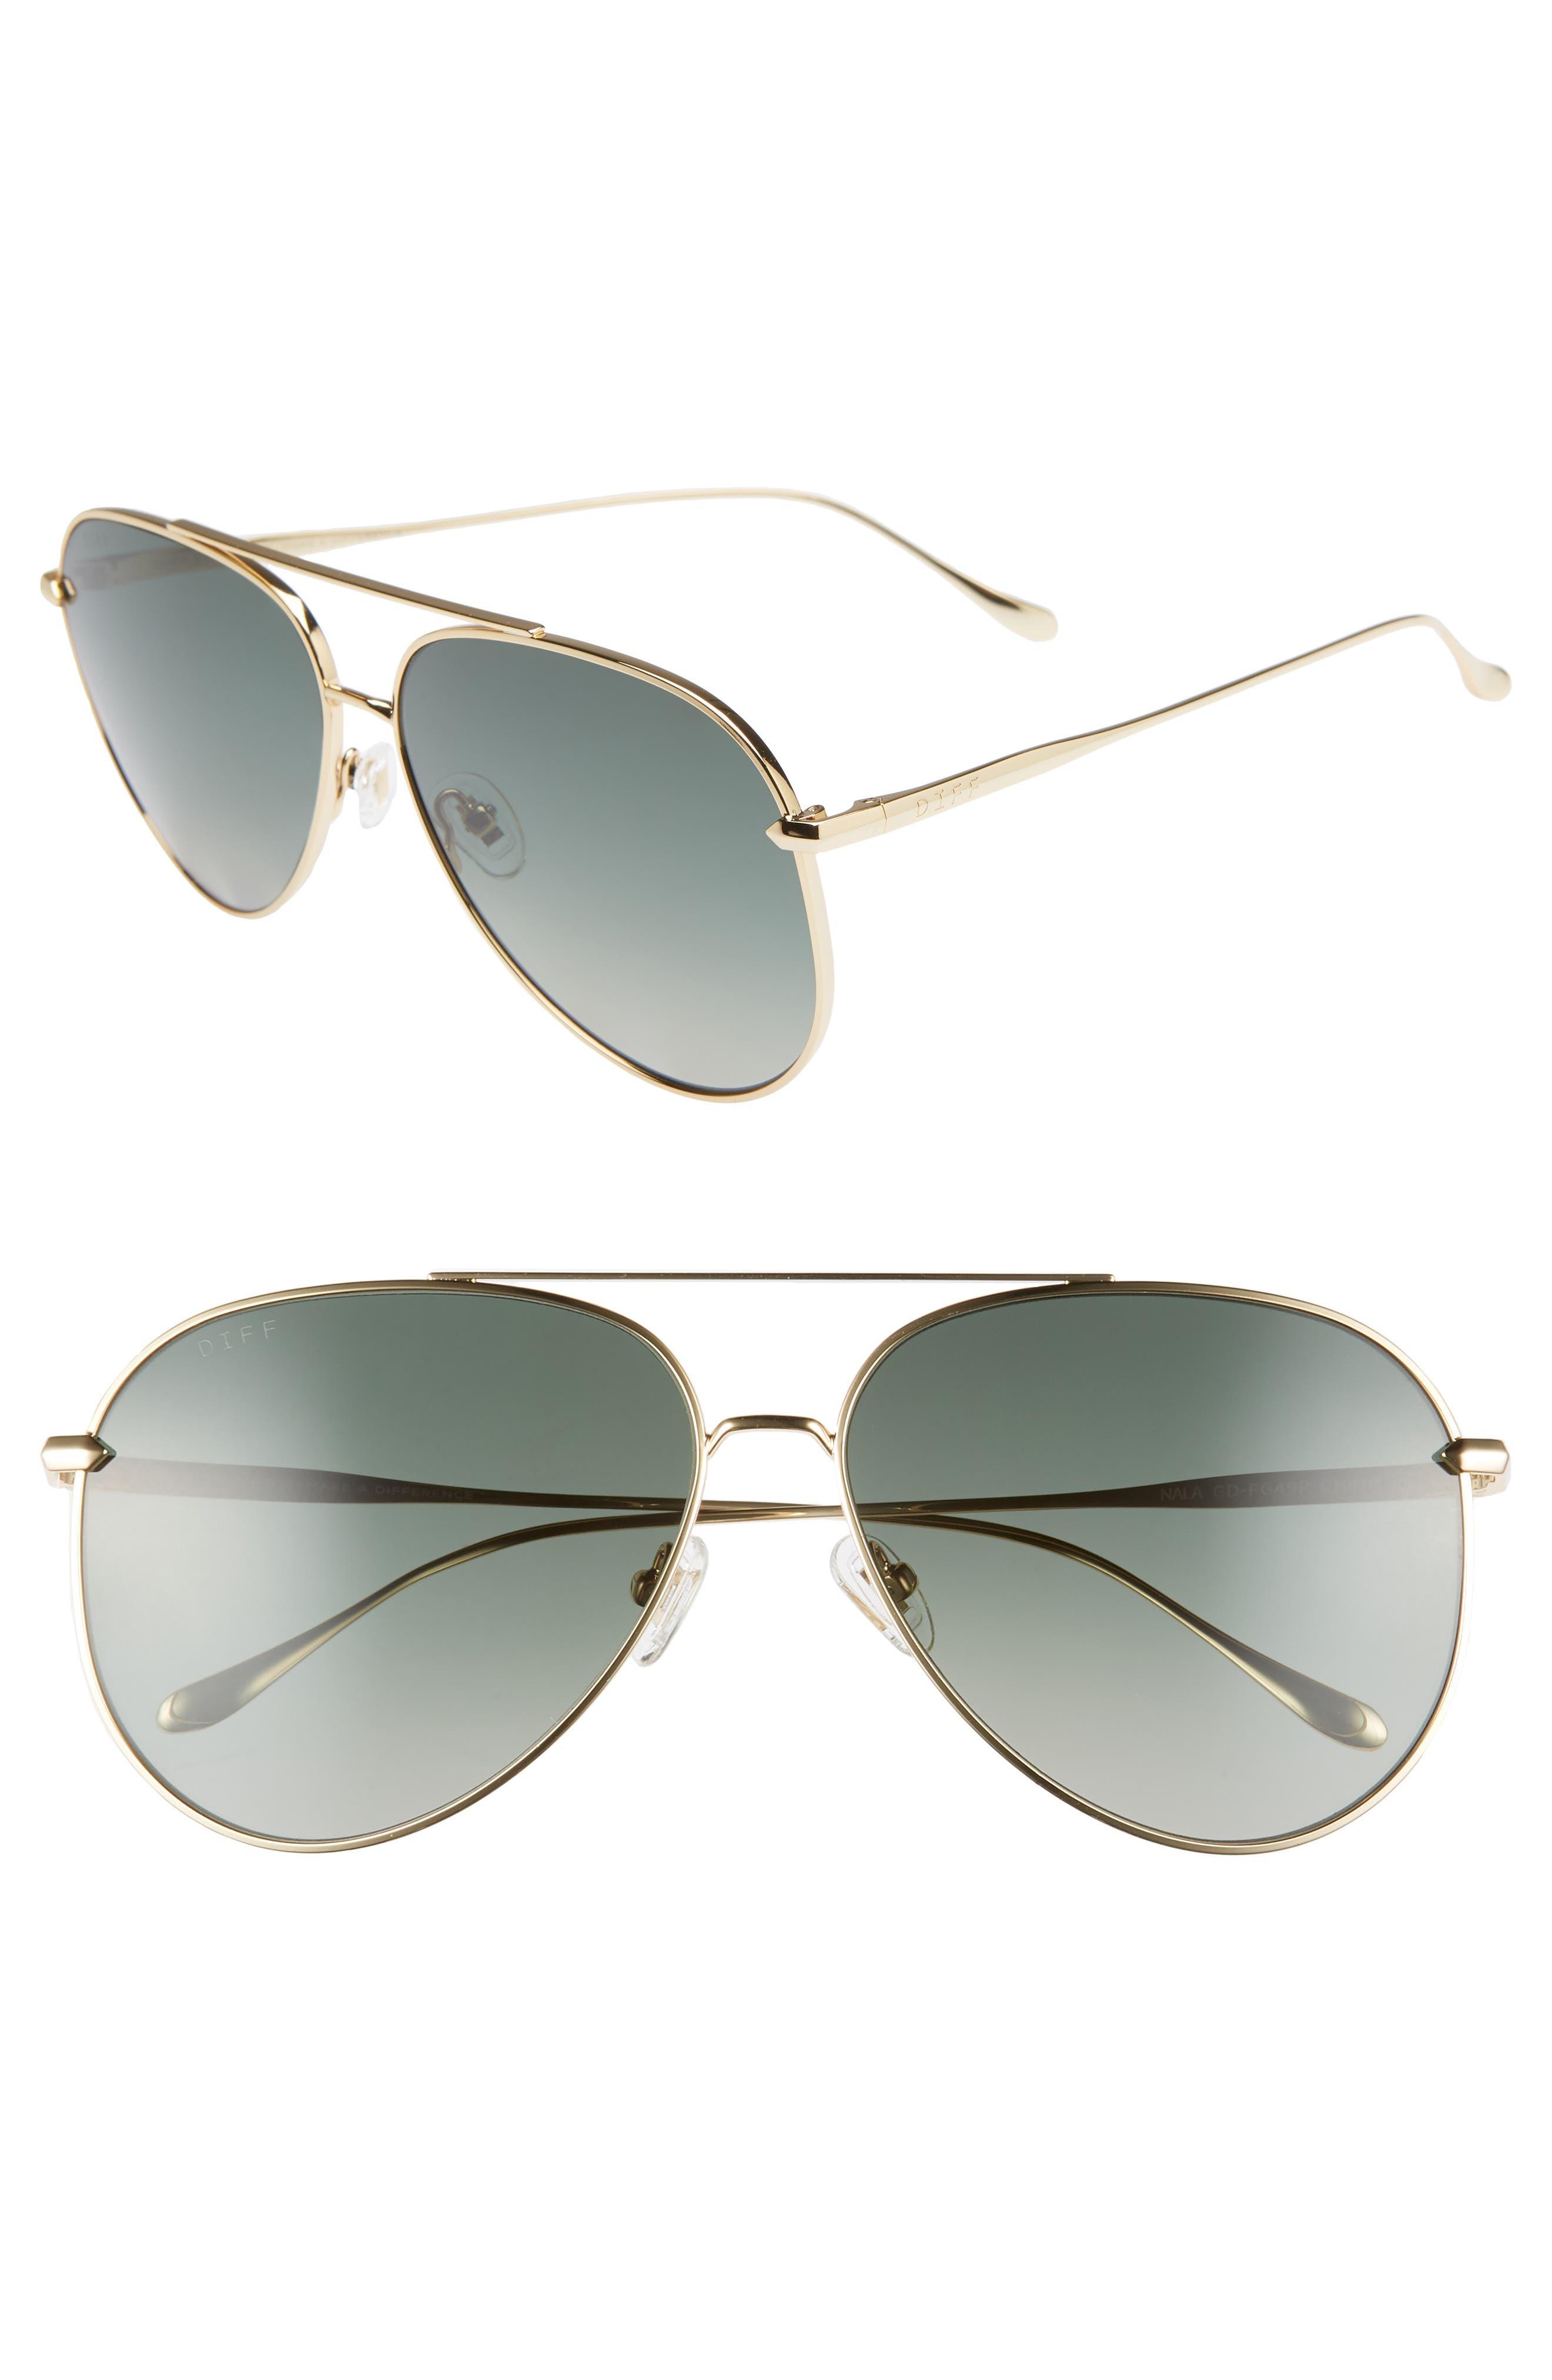 Nala 63mm Oversize Polarized Aviator Sunglasses,                             Main thumbnail 1, color,                             GOLD/ G15